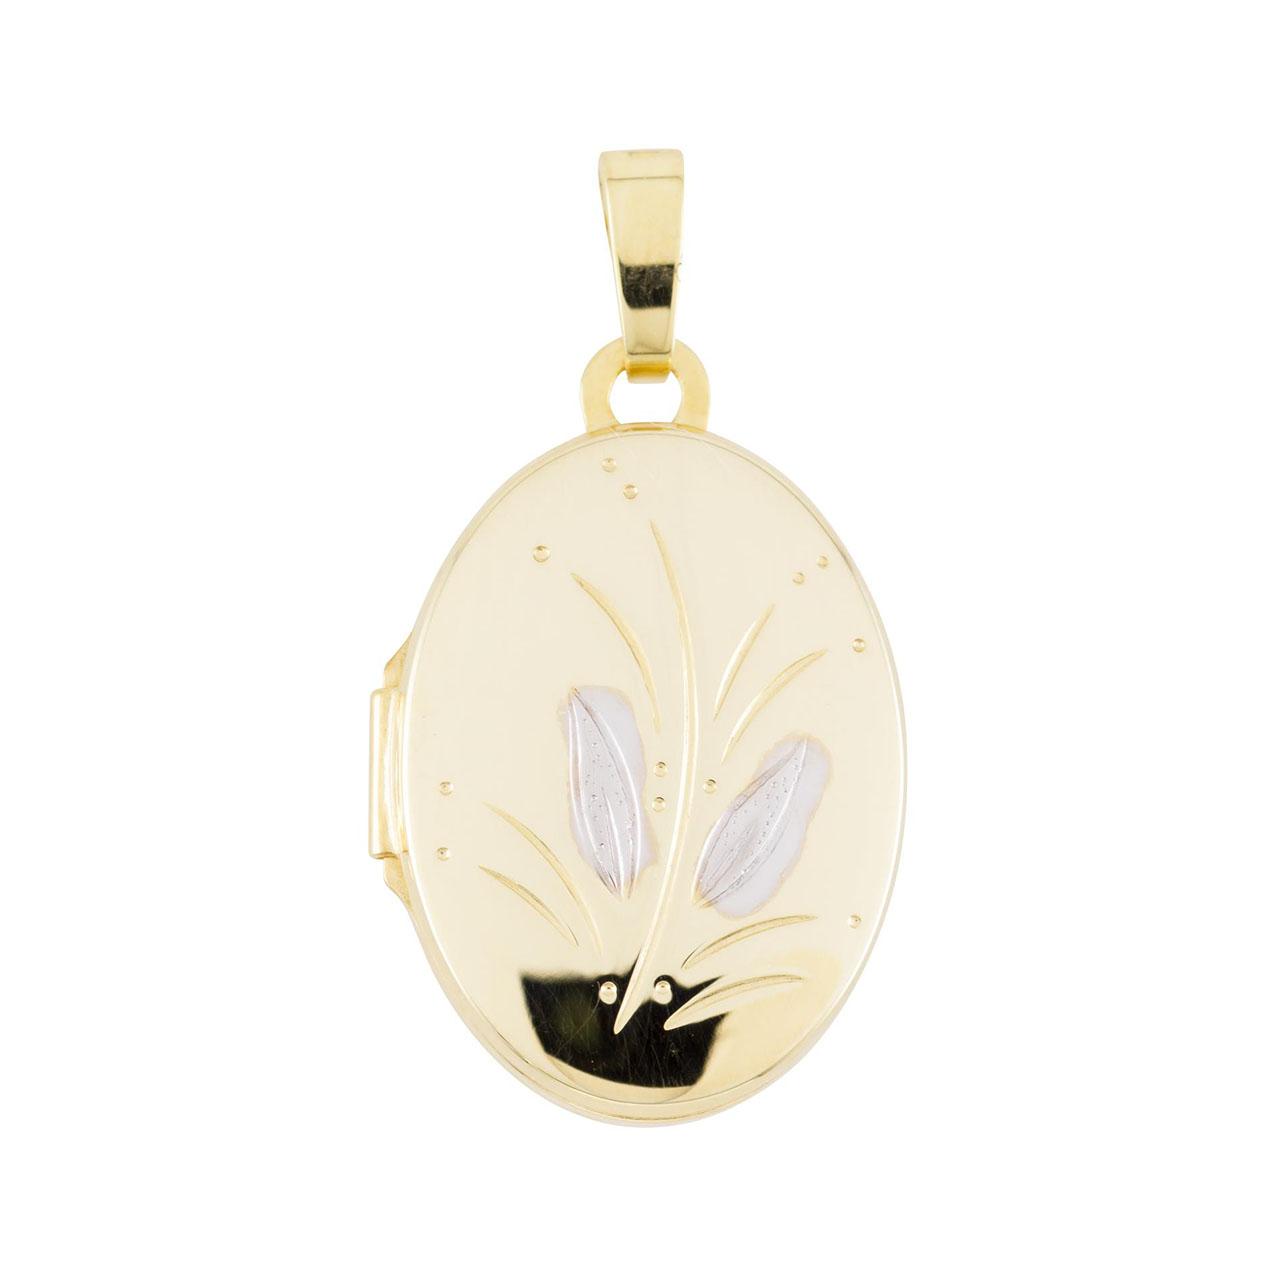 Glow Gouden Medaillon Ovaal 14 x 26 mm 245.0083.00